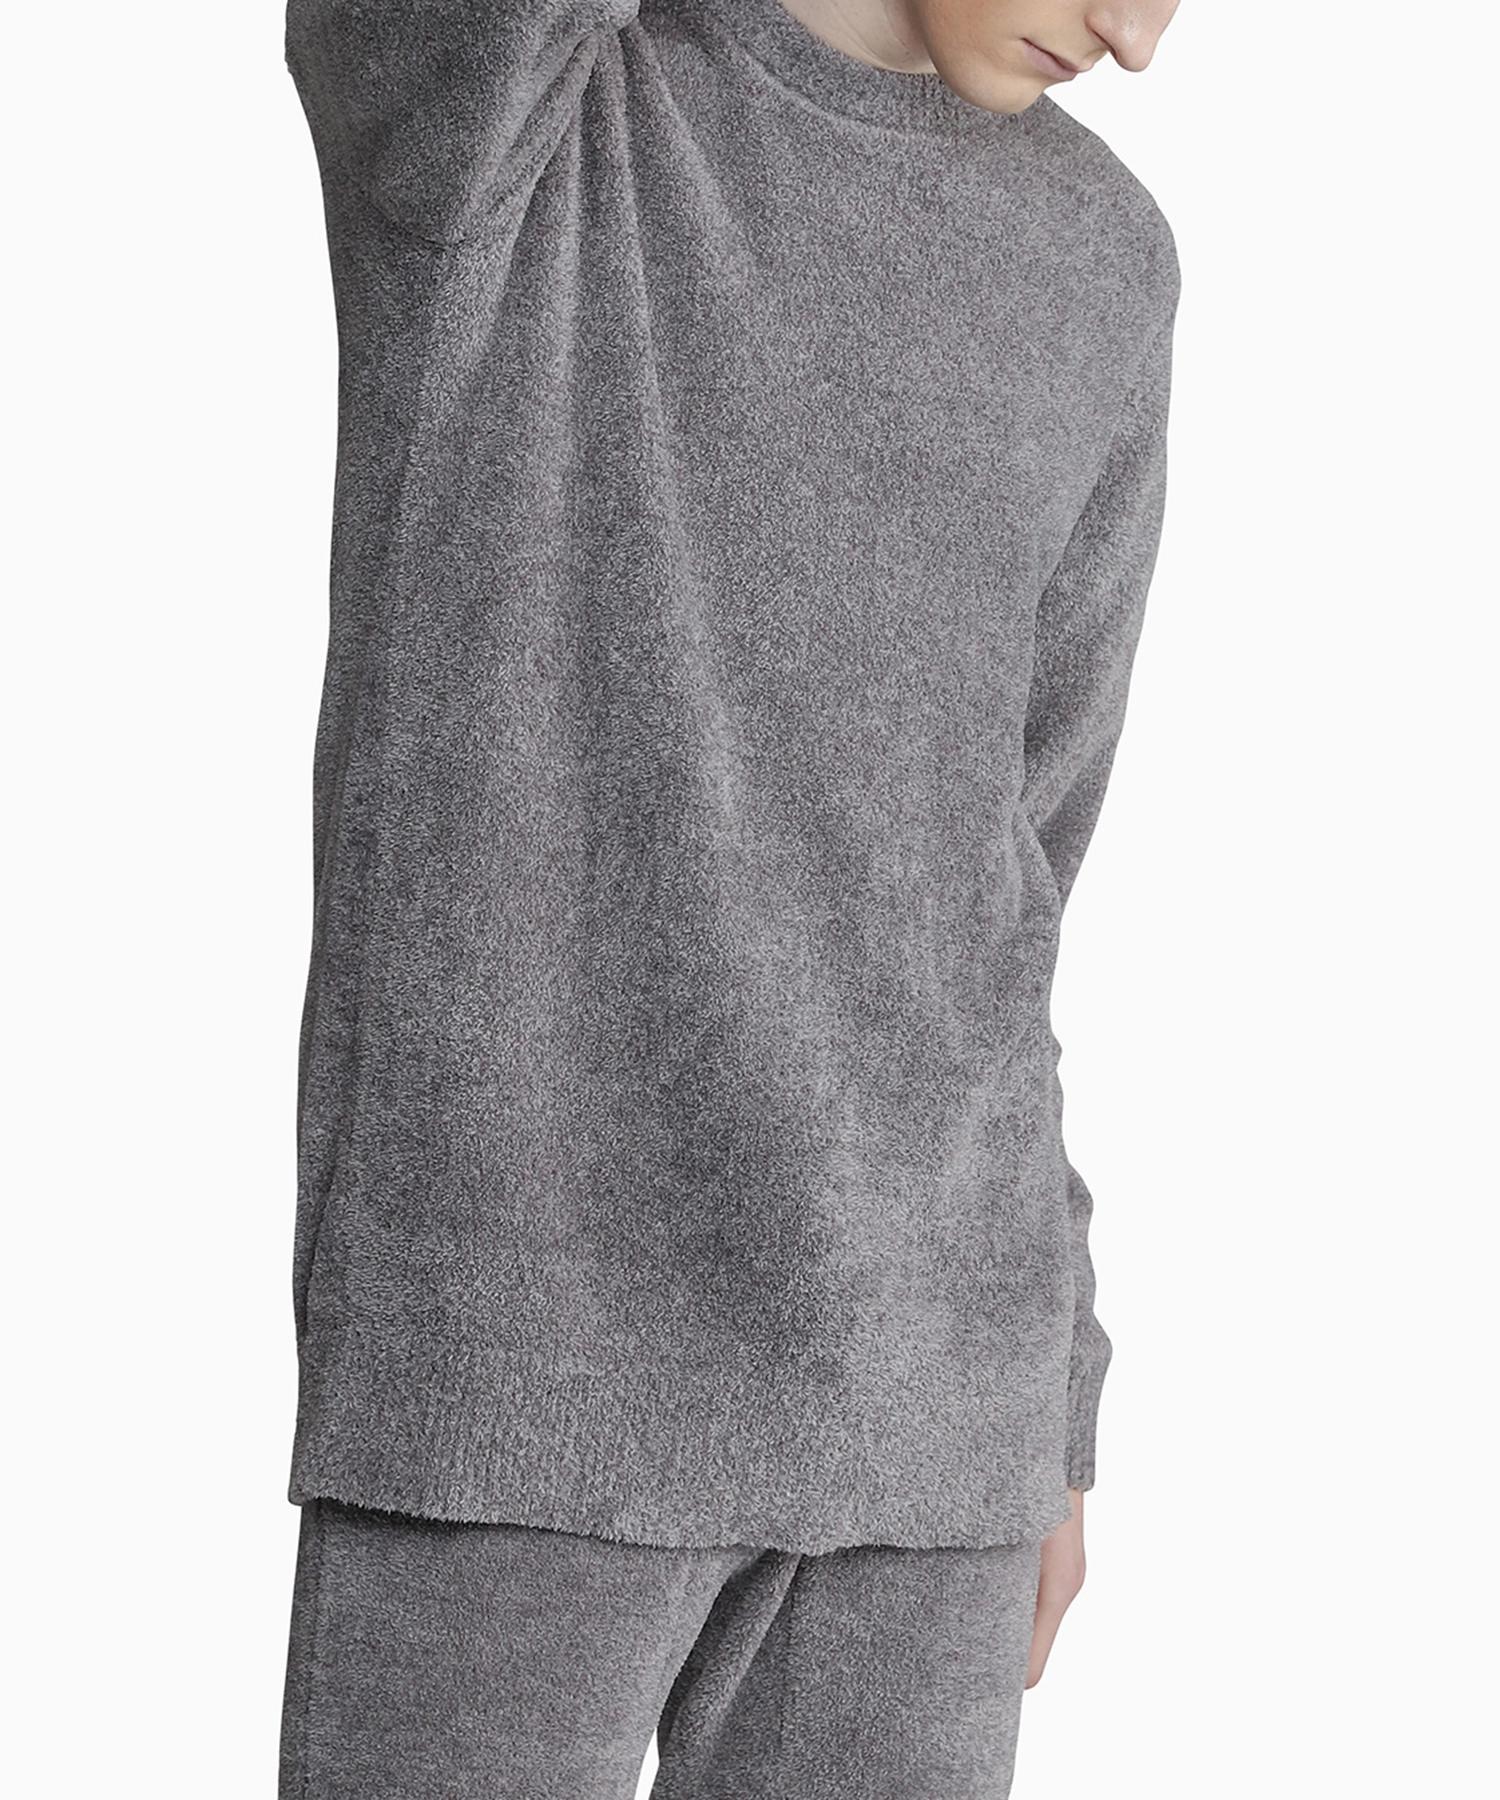 MOCO room wear tops